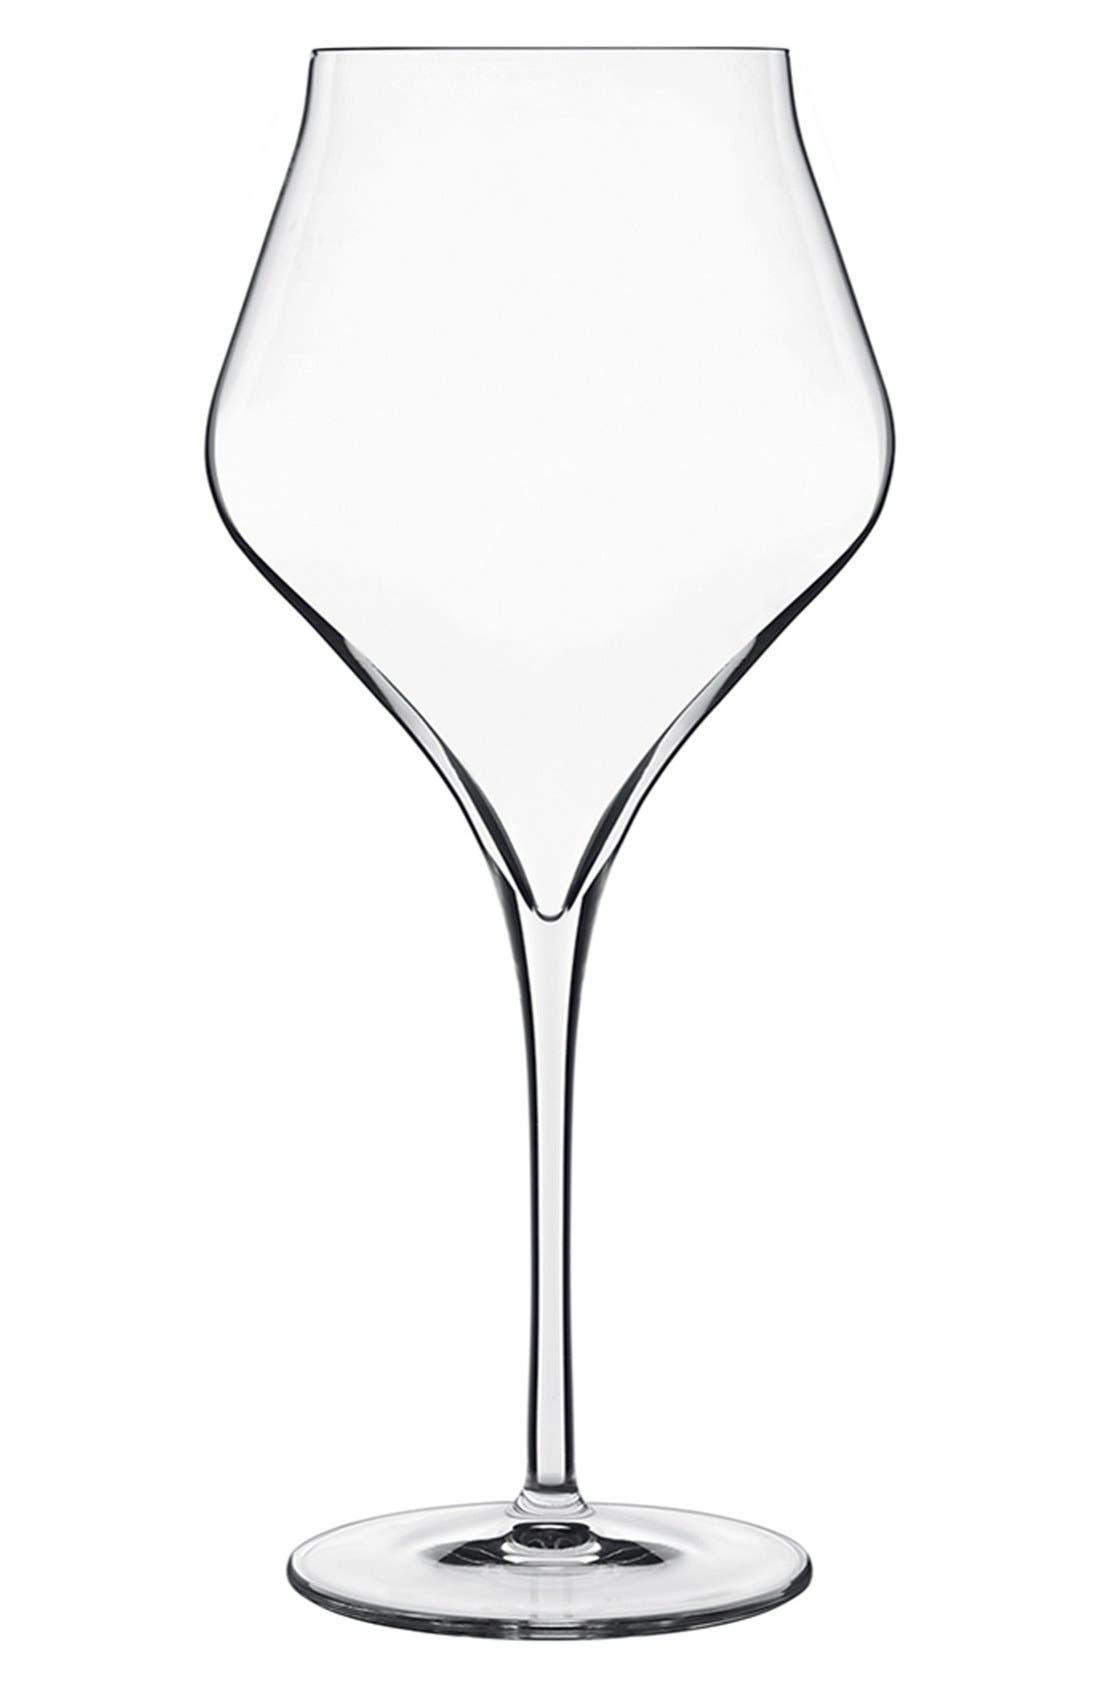 Luigi Bormioli 'Supremo' Burgundy Wine Glasses (Set of 6)